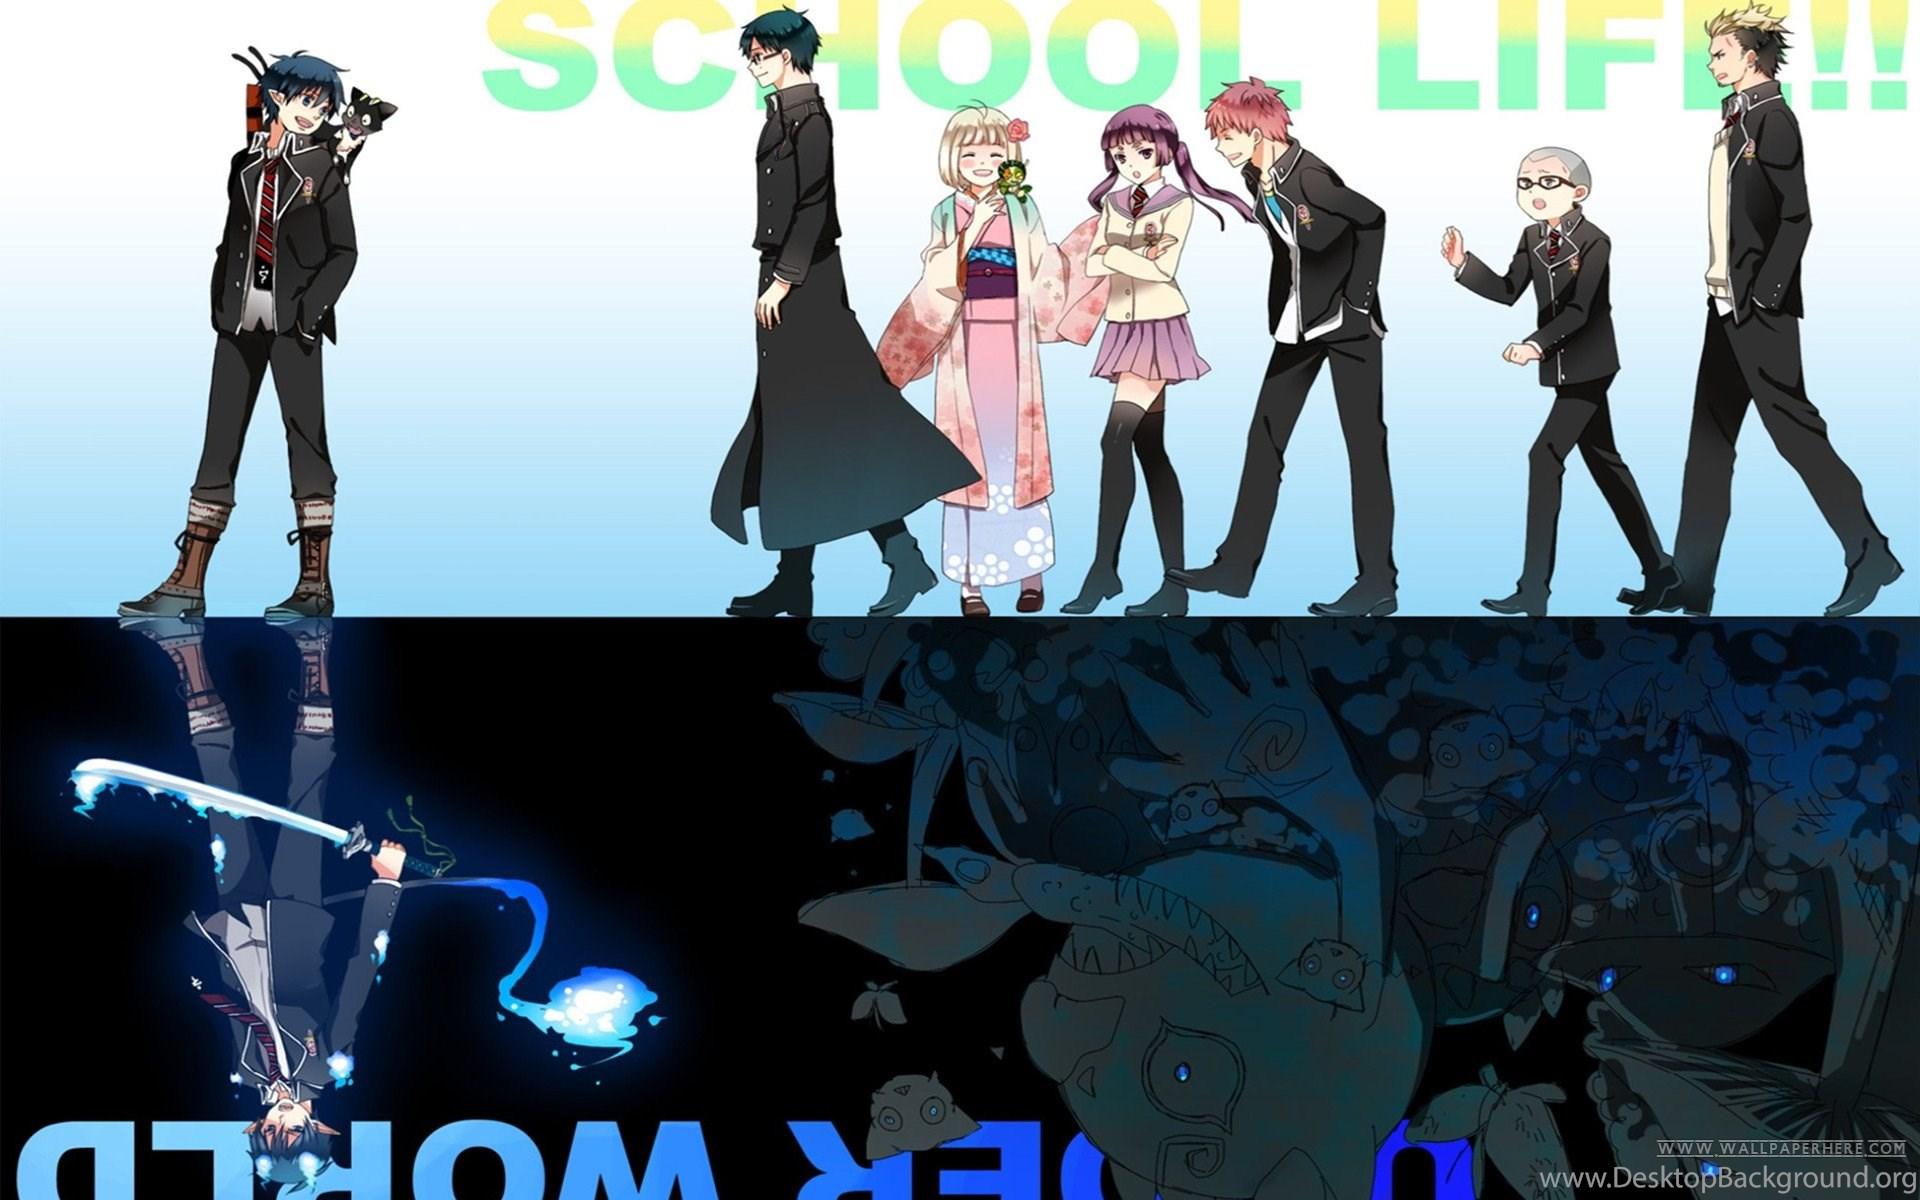 16 Kuro Ao No Exorcist Hd Wallpapers Desktop Background